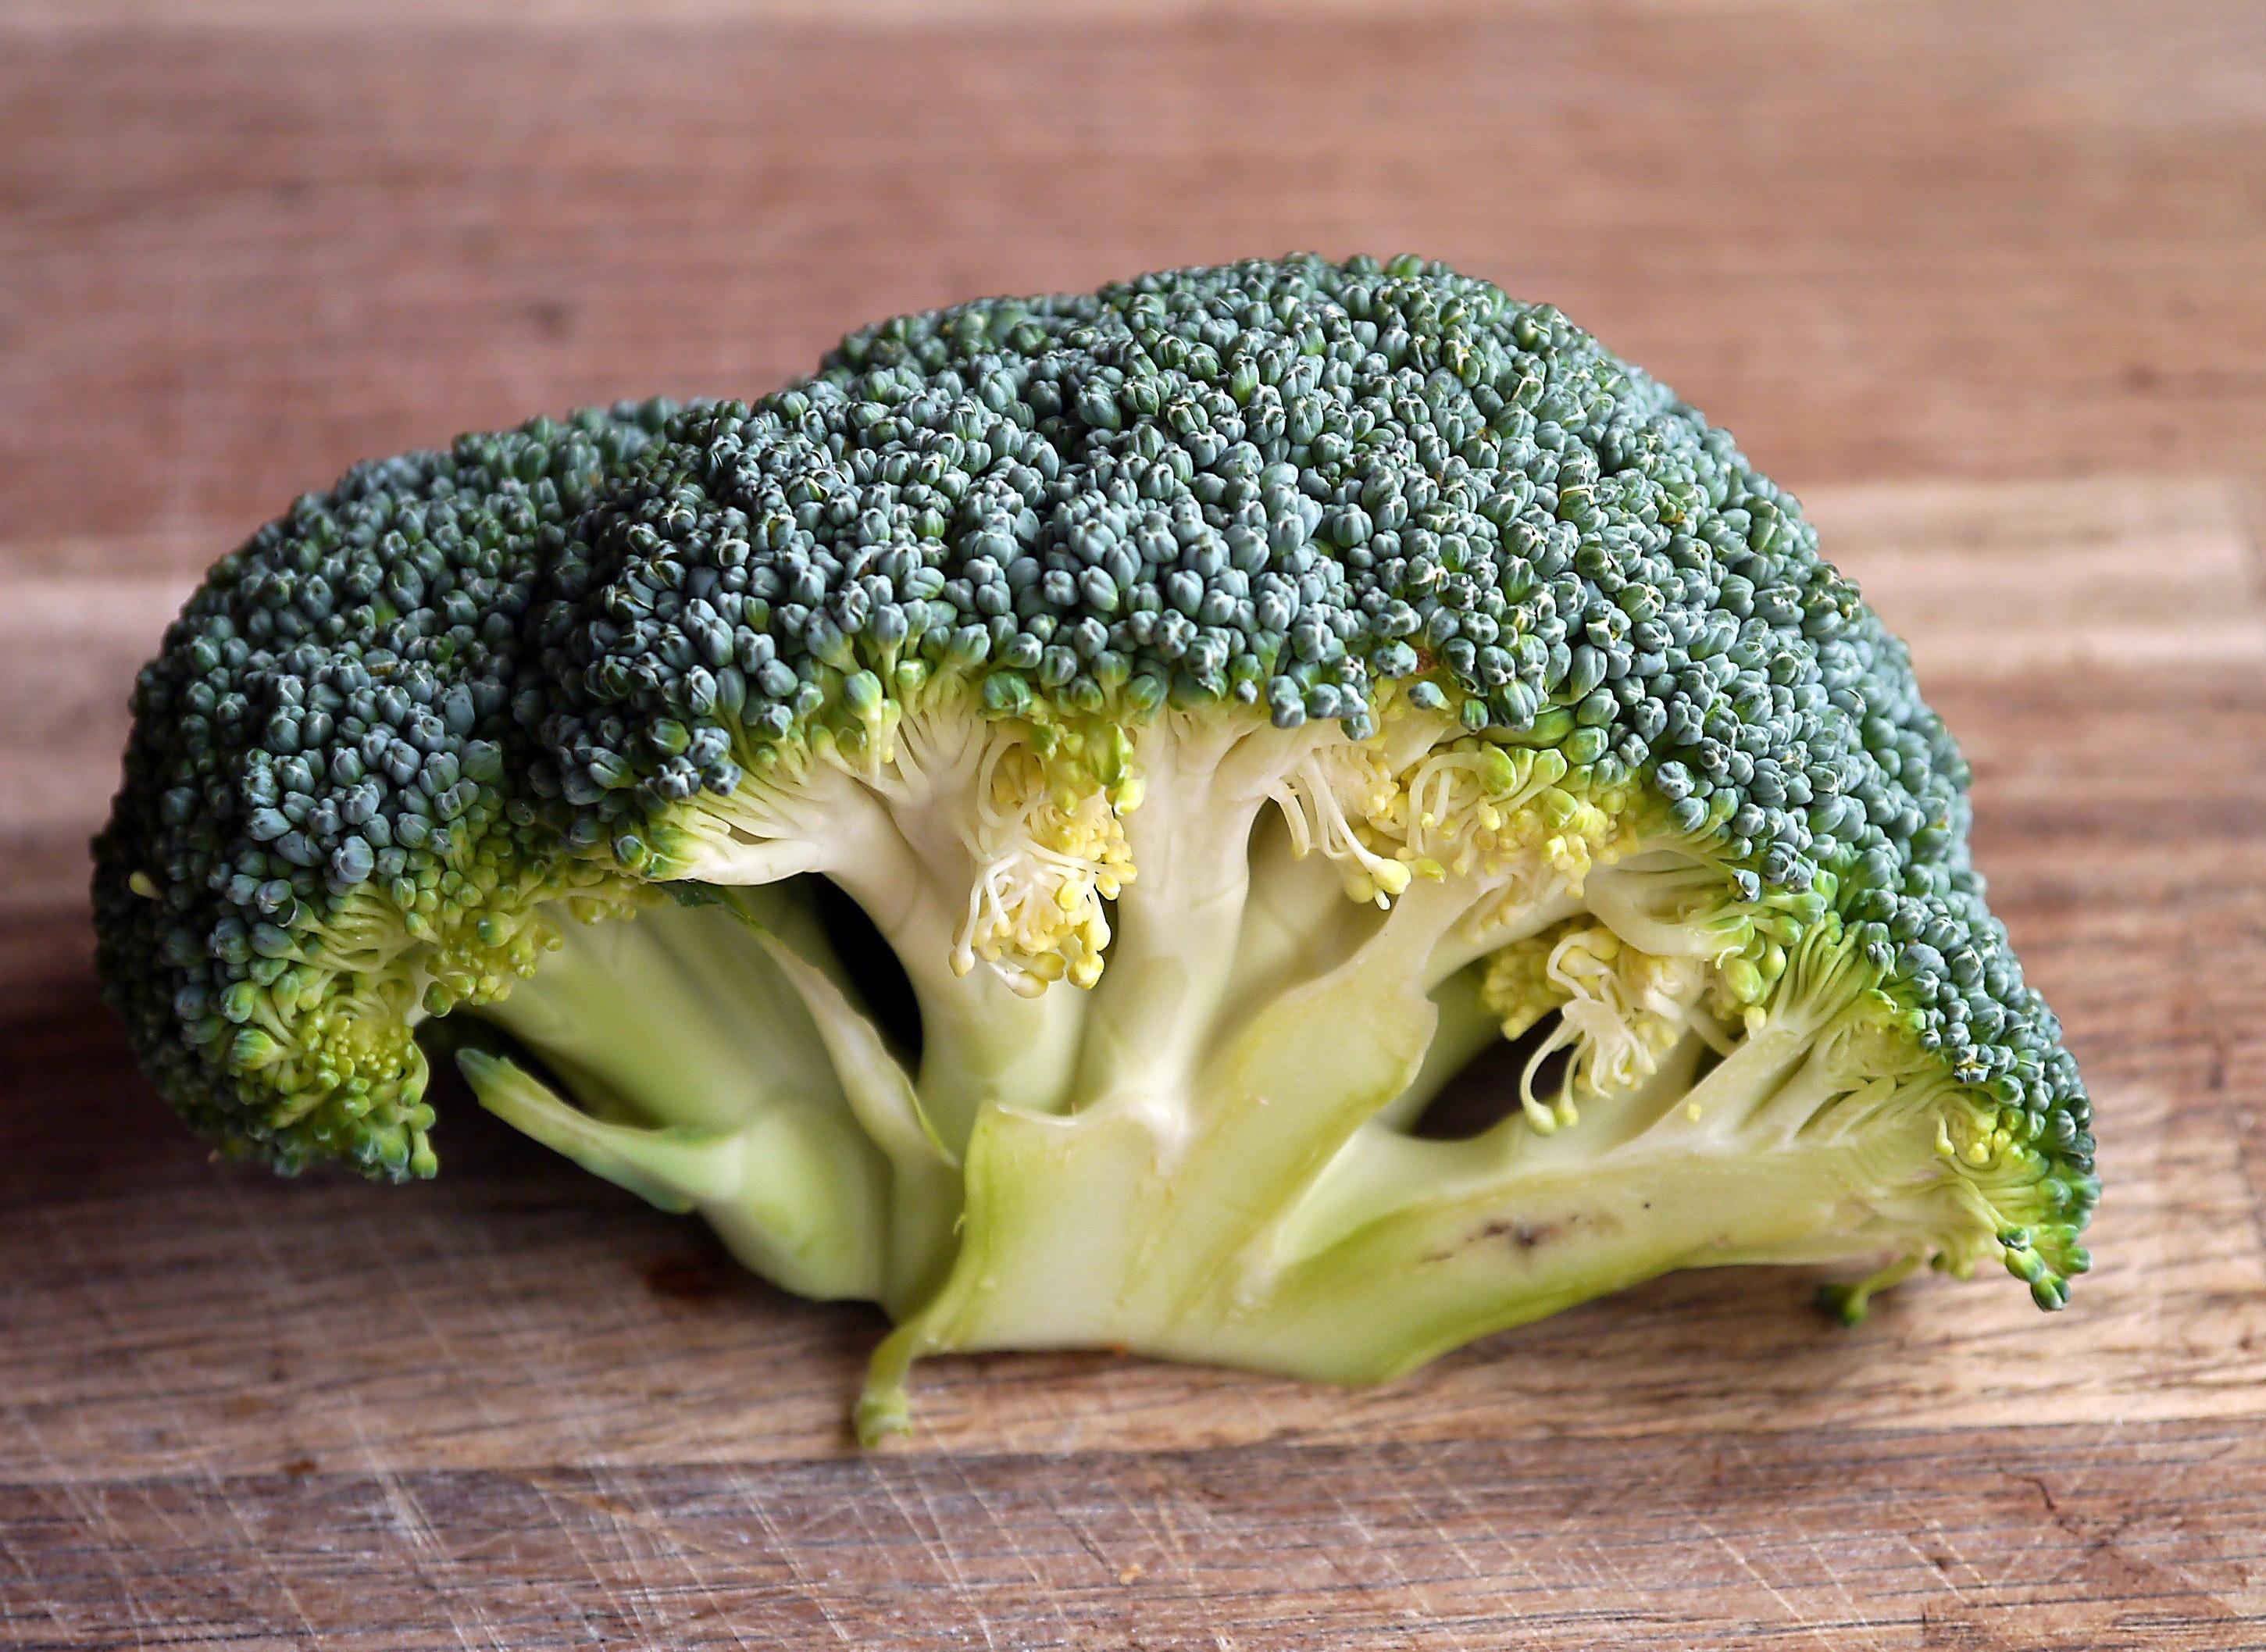 broccoli-food-fresh-47347.jpg